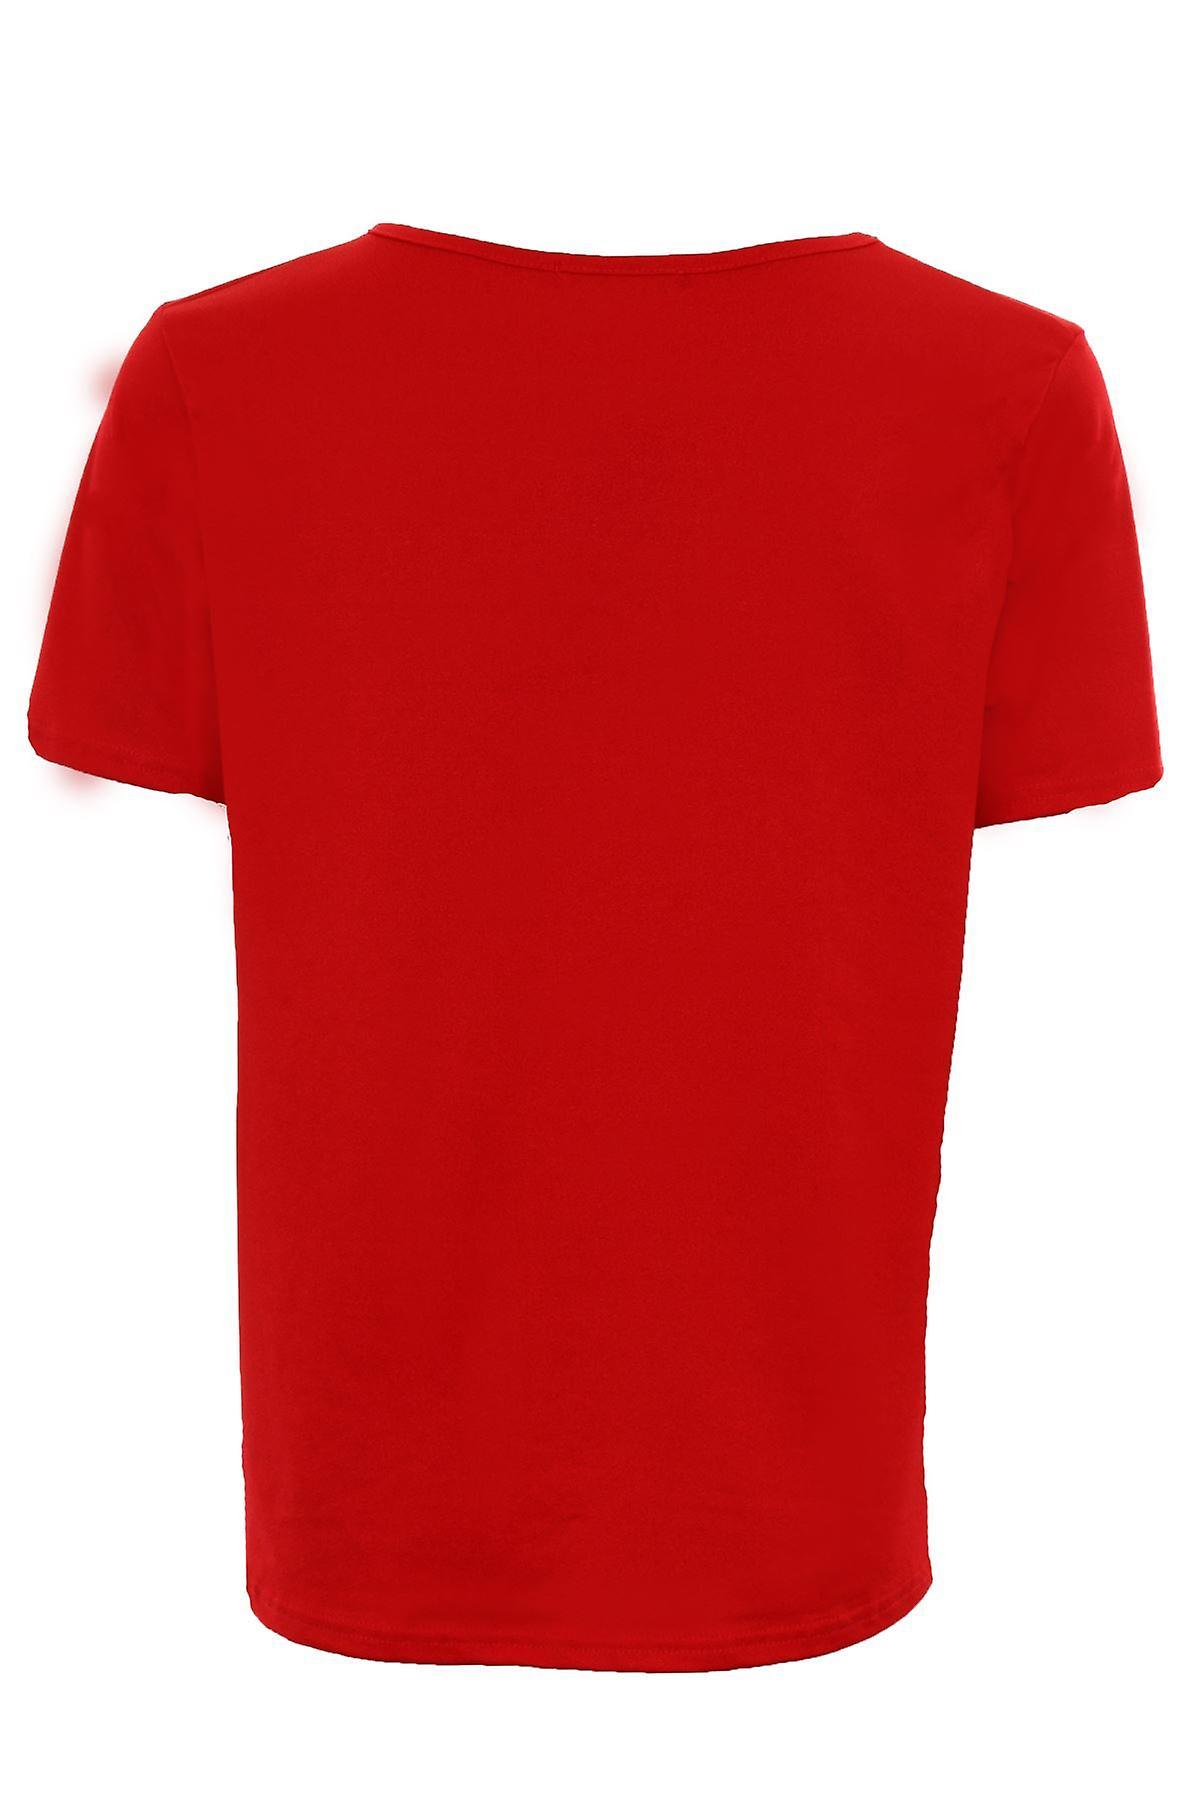 Ladies Plain Baggy Crape Stretch Tunic Short Sleeve Loose Women's Top T-Shirt